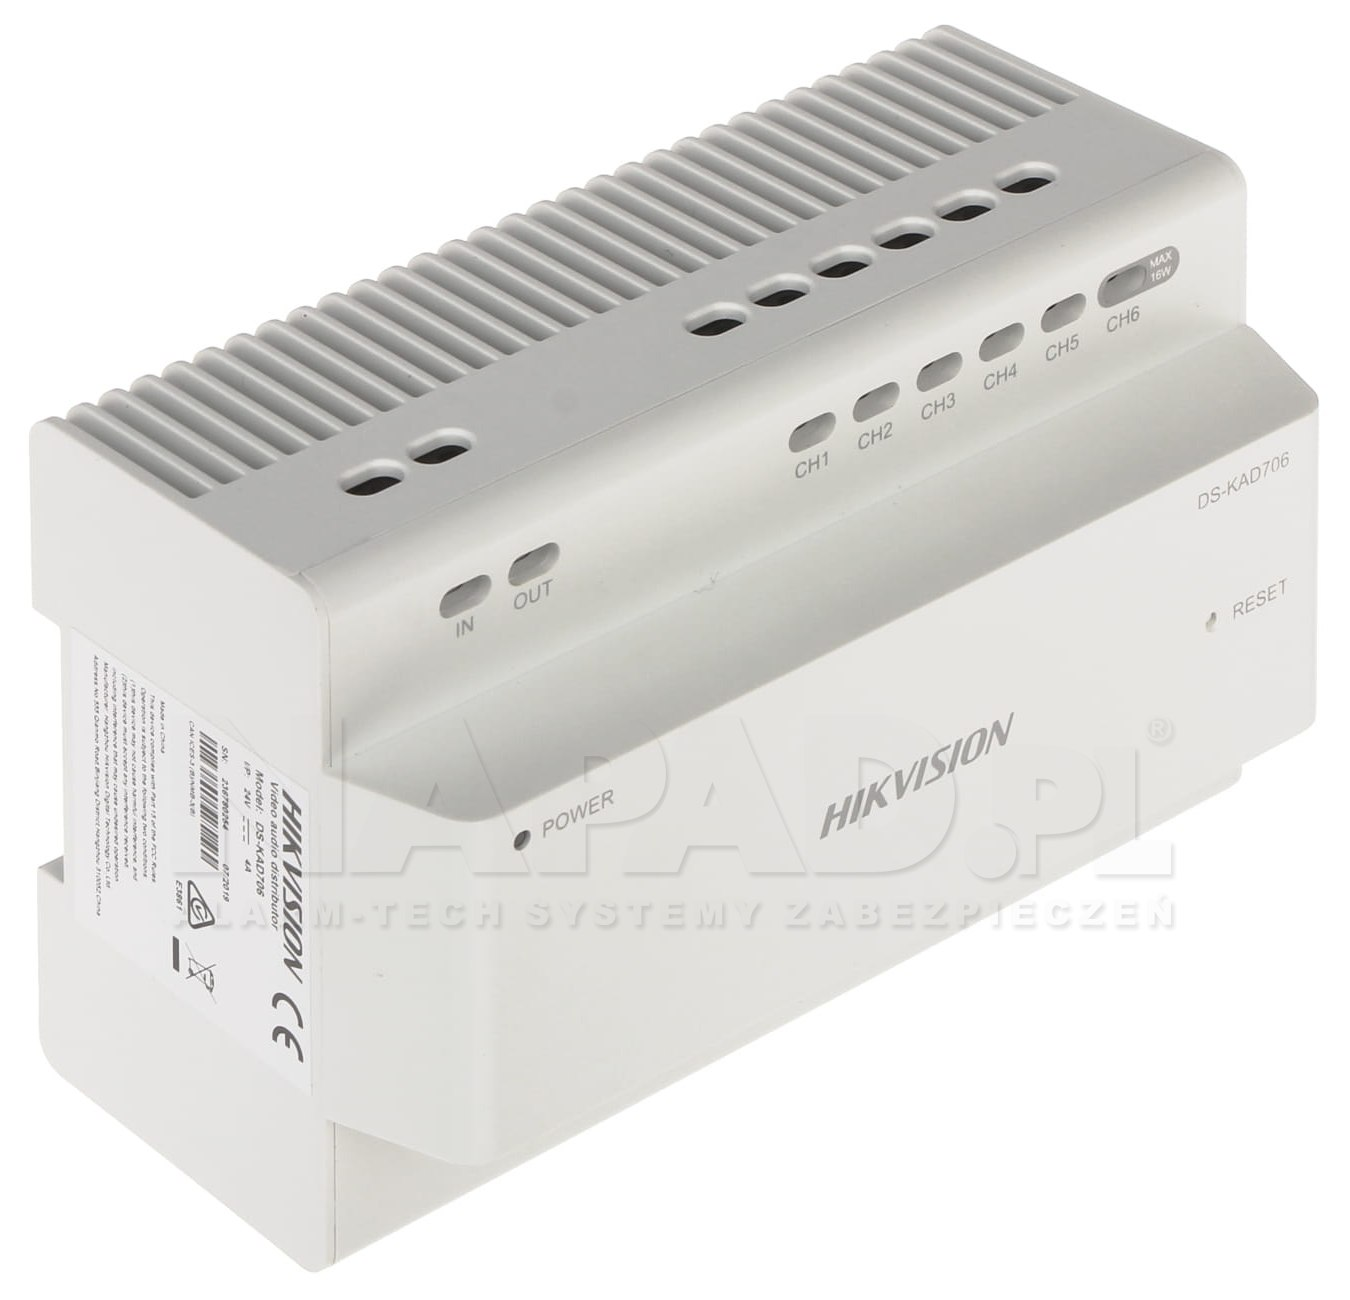 Dystrybutor interkomowy audio/wideo DS-KAD706